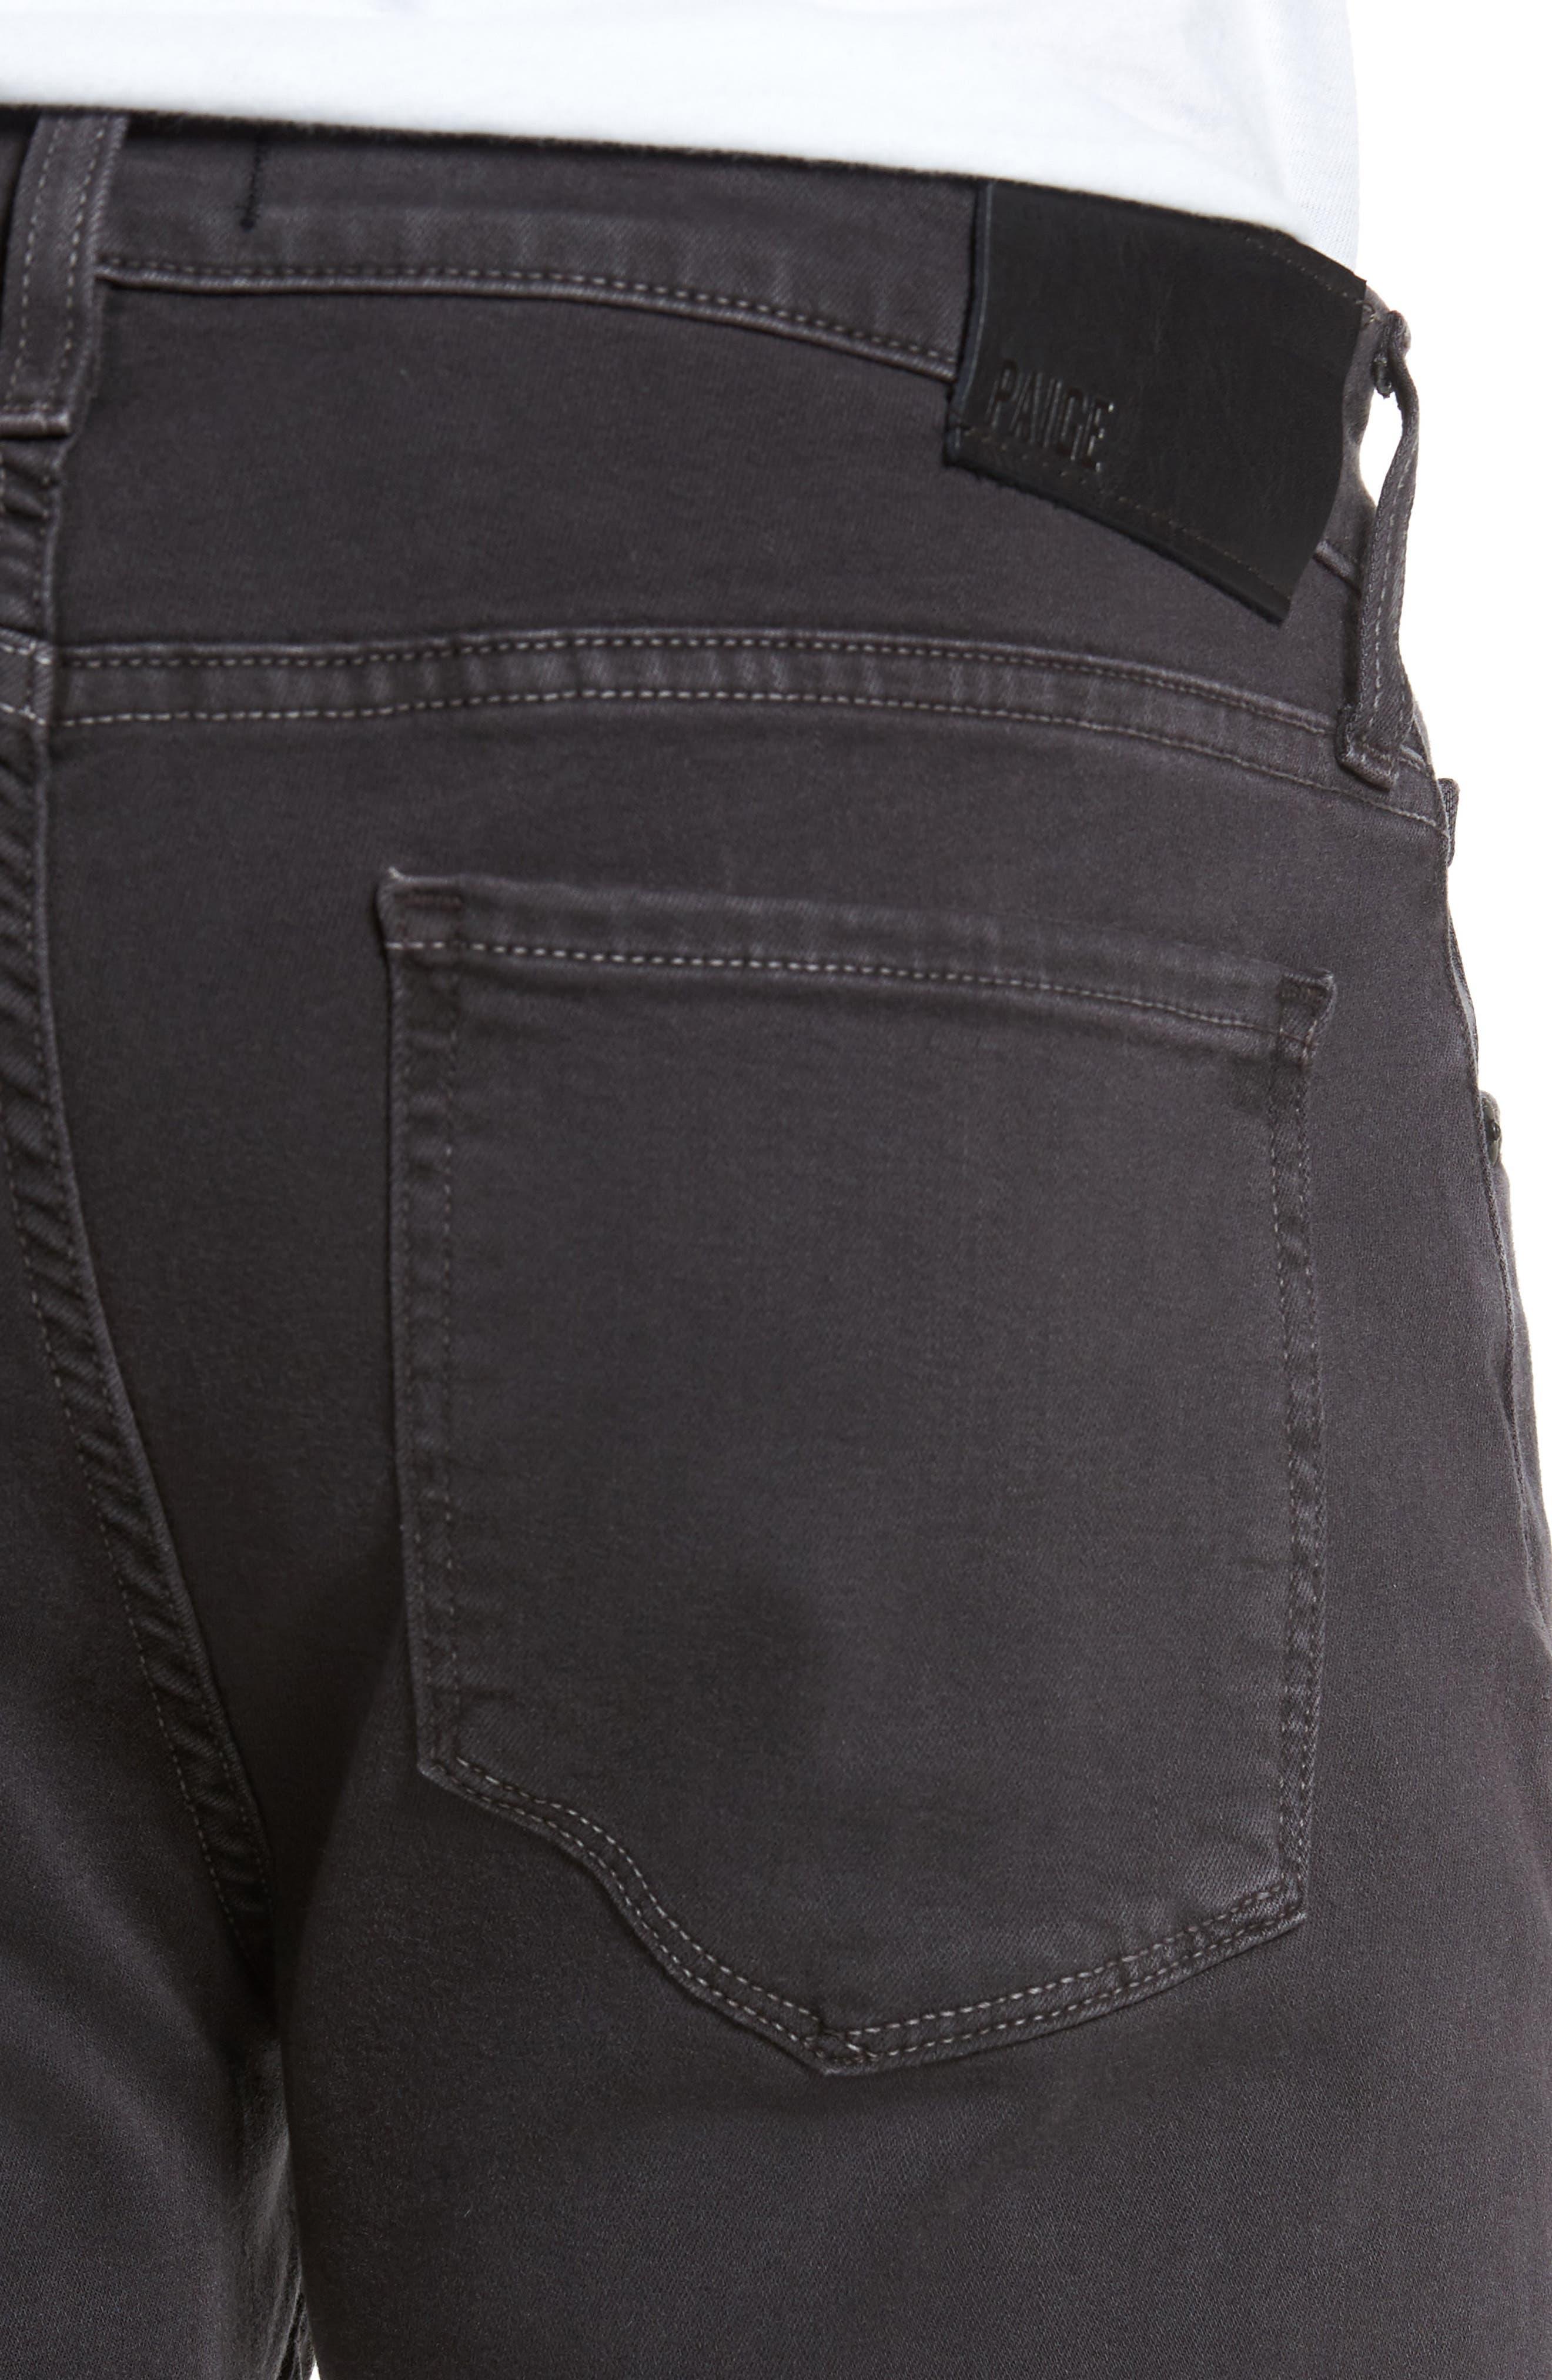 Alternate Image 4  - PAIGE Transcend - Federal Slim Straight Leg Jeans (Vintage Anchor)